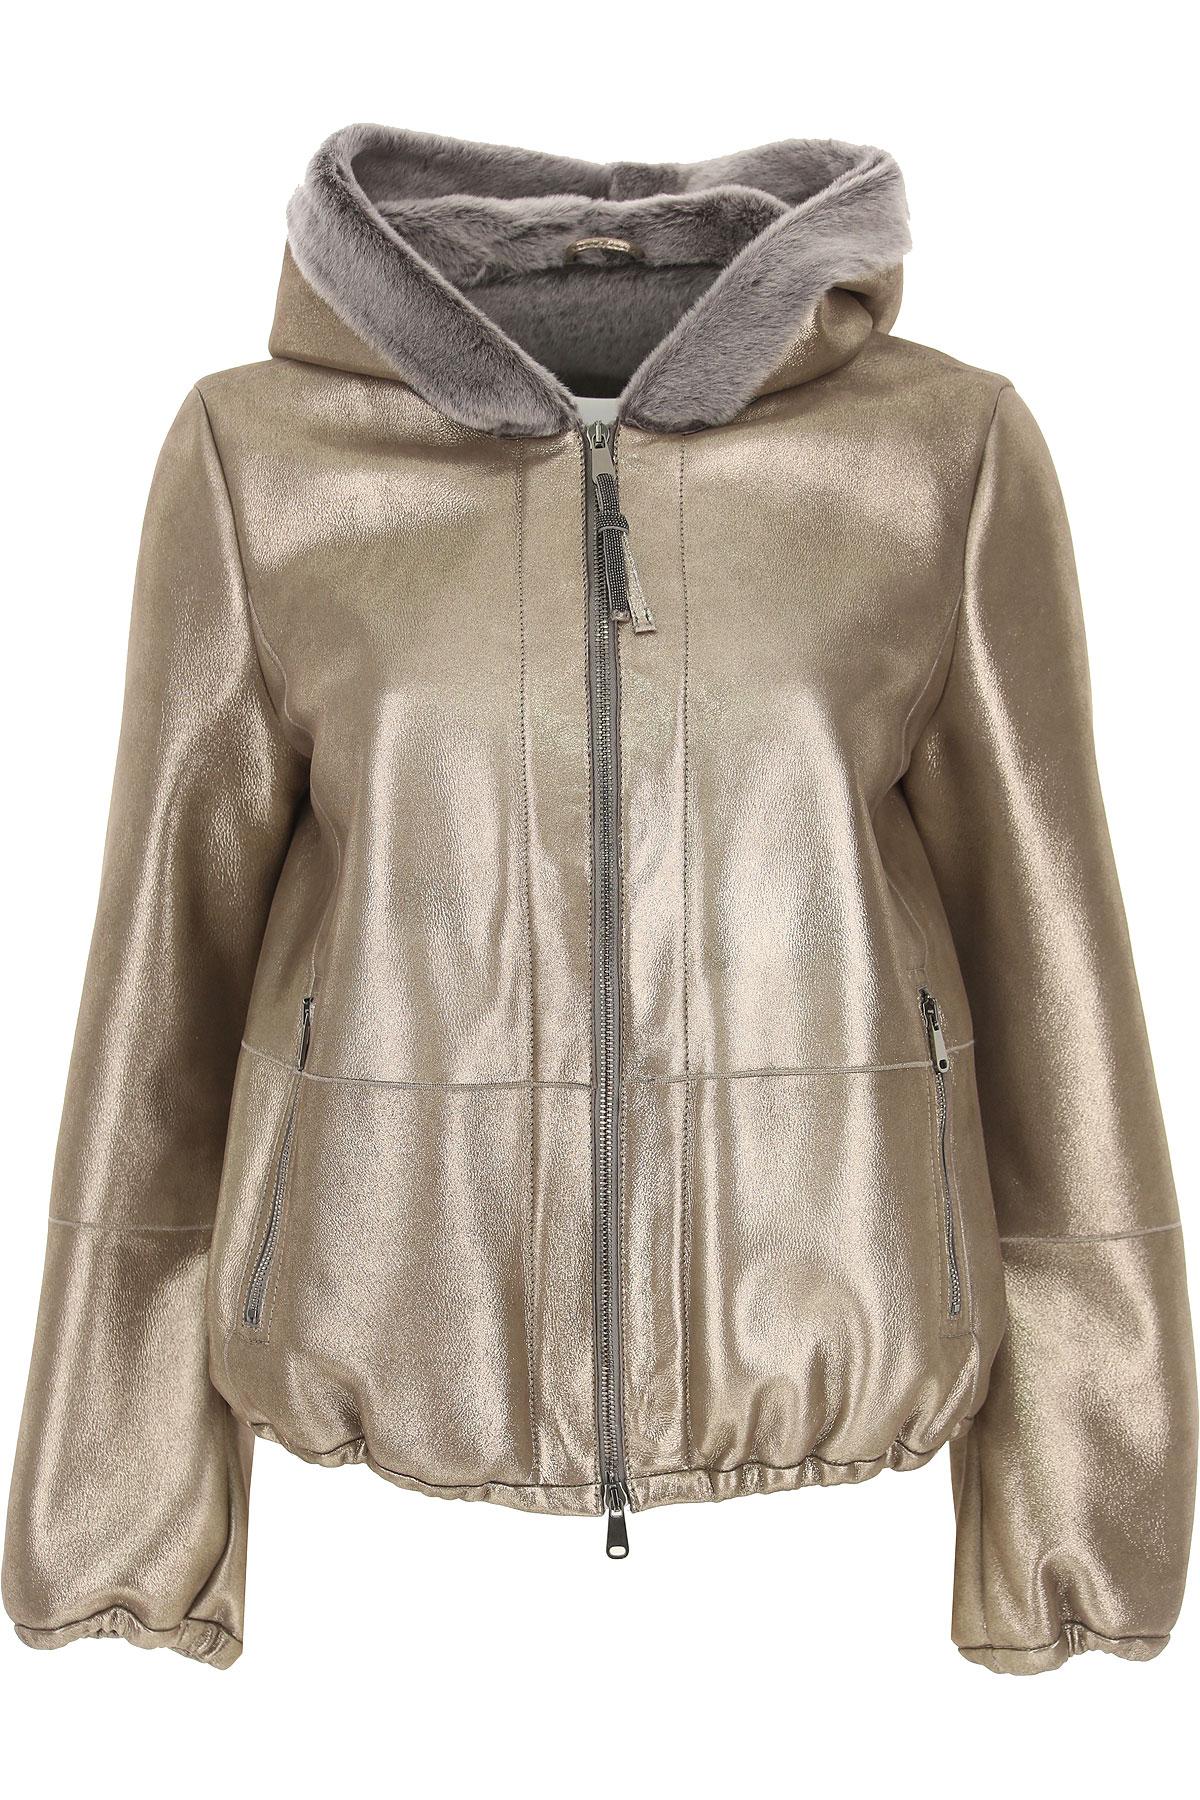 Brunello Cucinelli Jacket for Women On Sale, Gold, acetate, 2019, 4 6